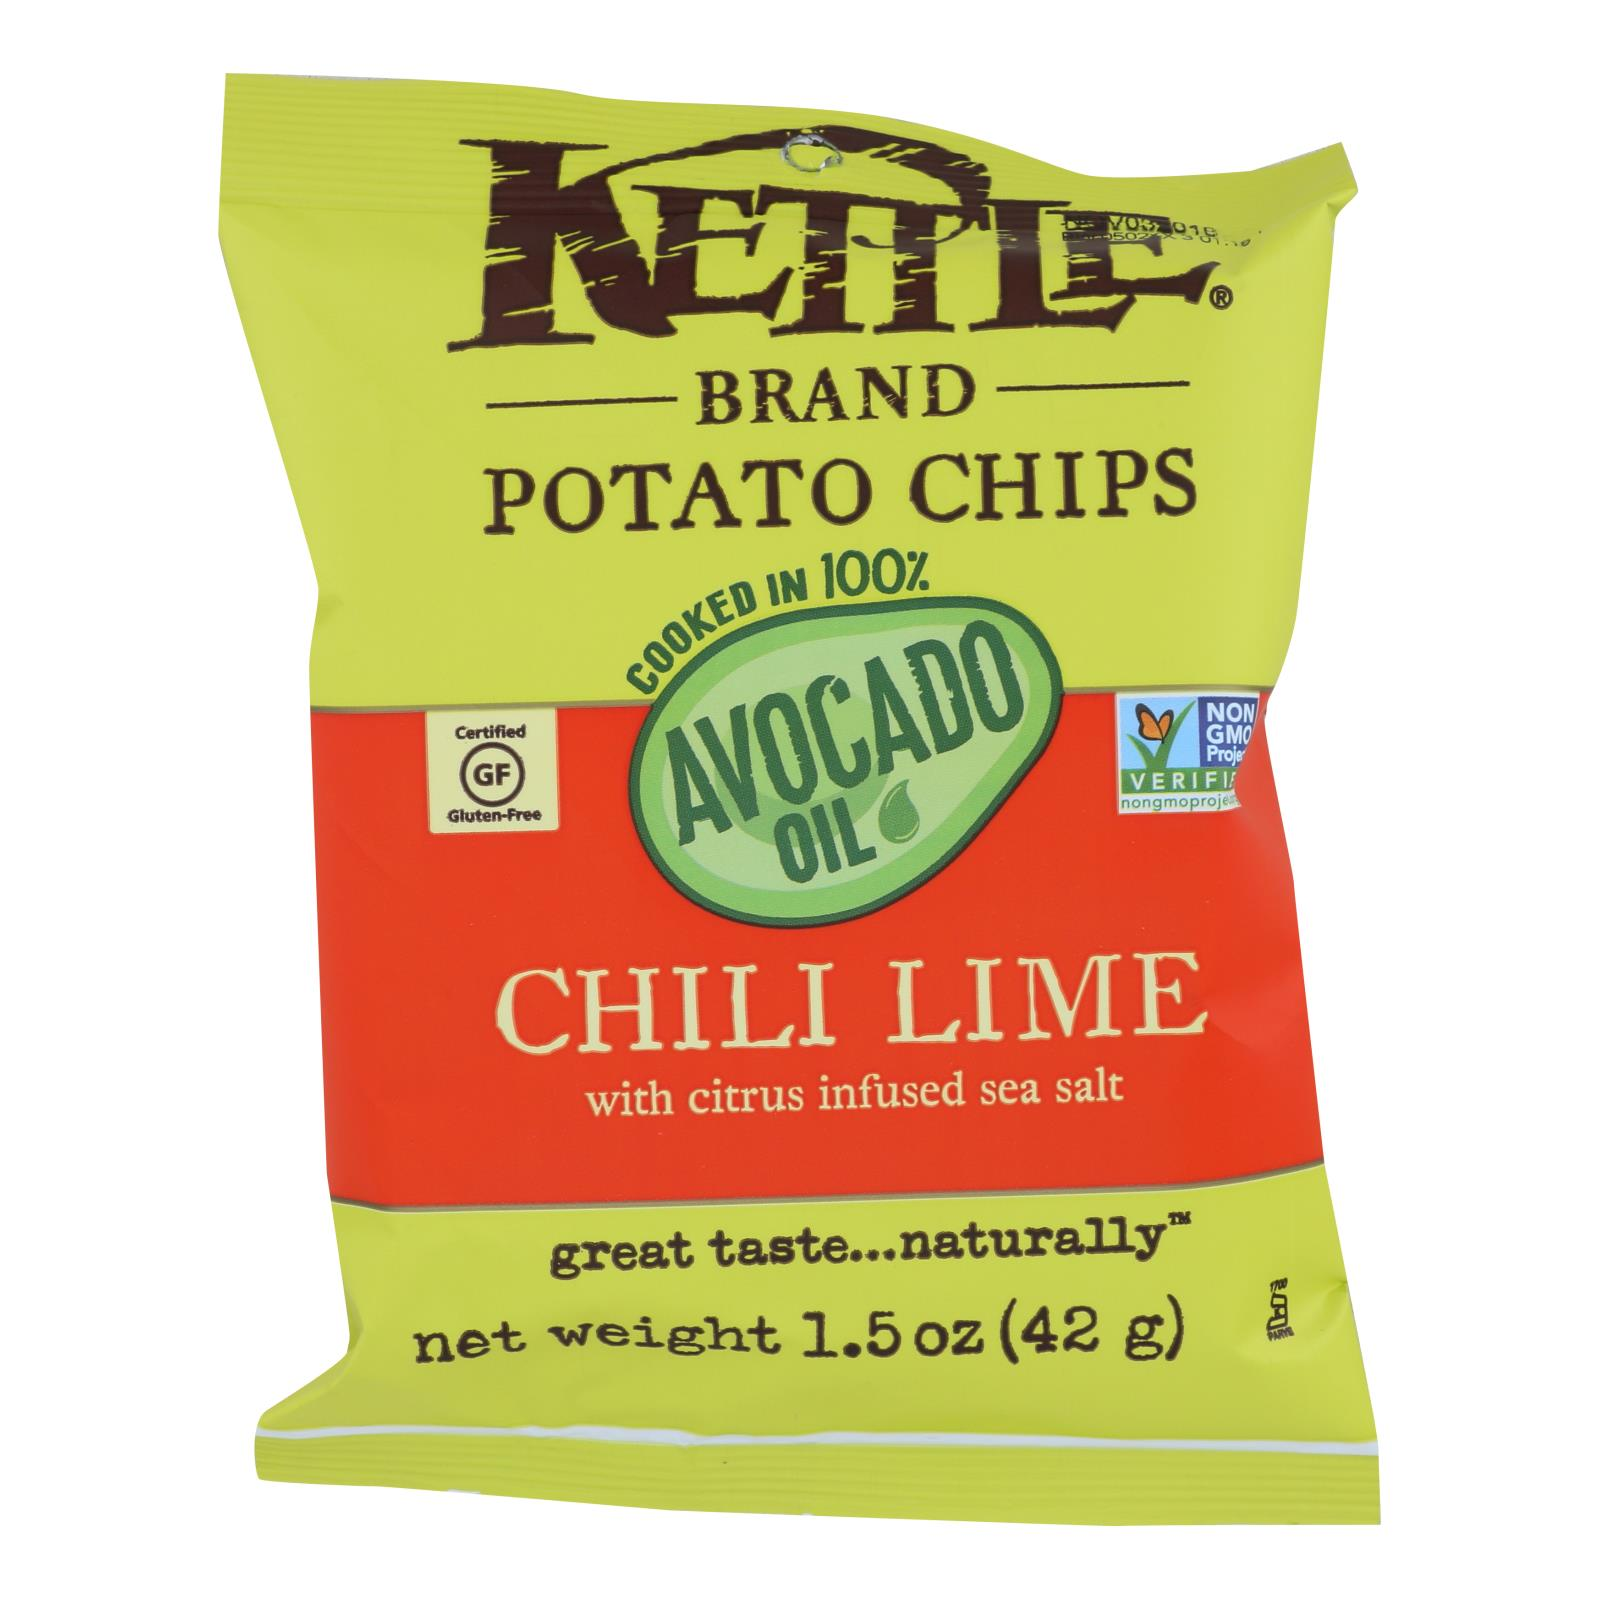 Kettle Brand - Pot Chips Avo Oil Chli Lm - Case of 24 - 1.5 OZ %count(alt)